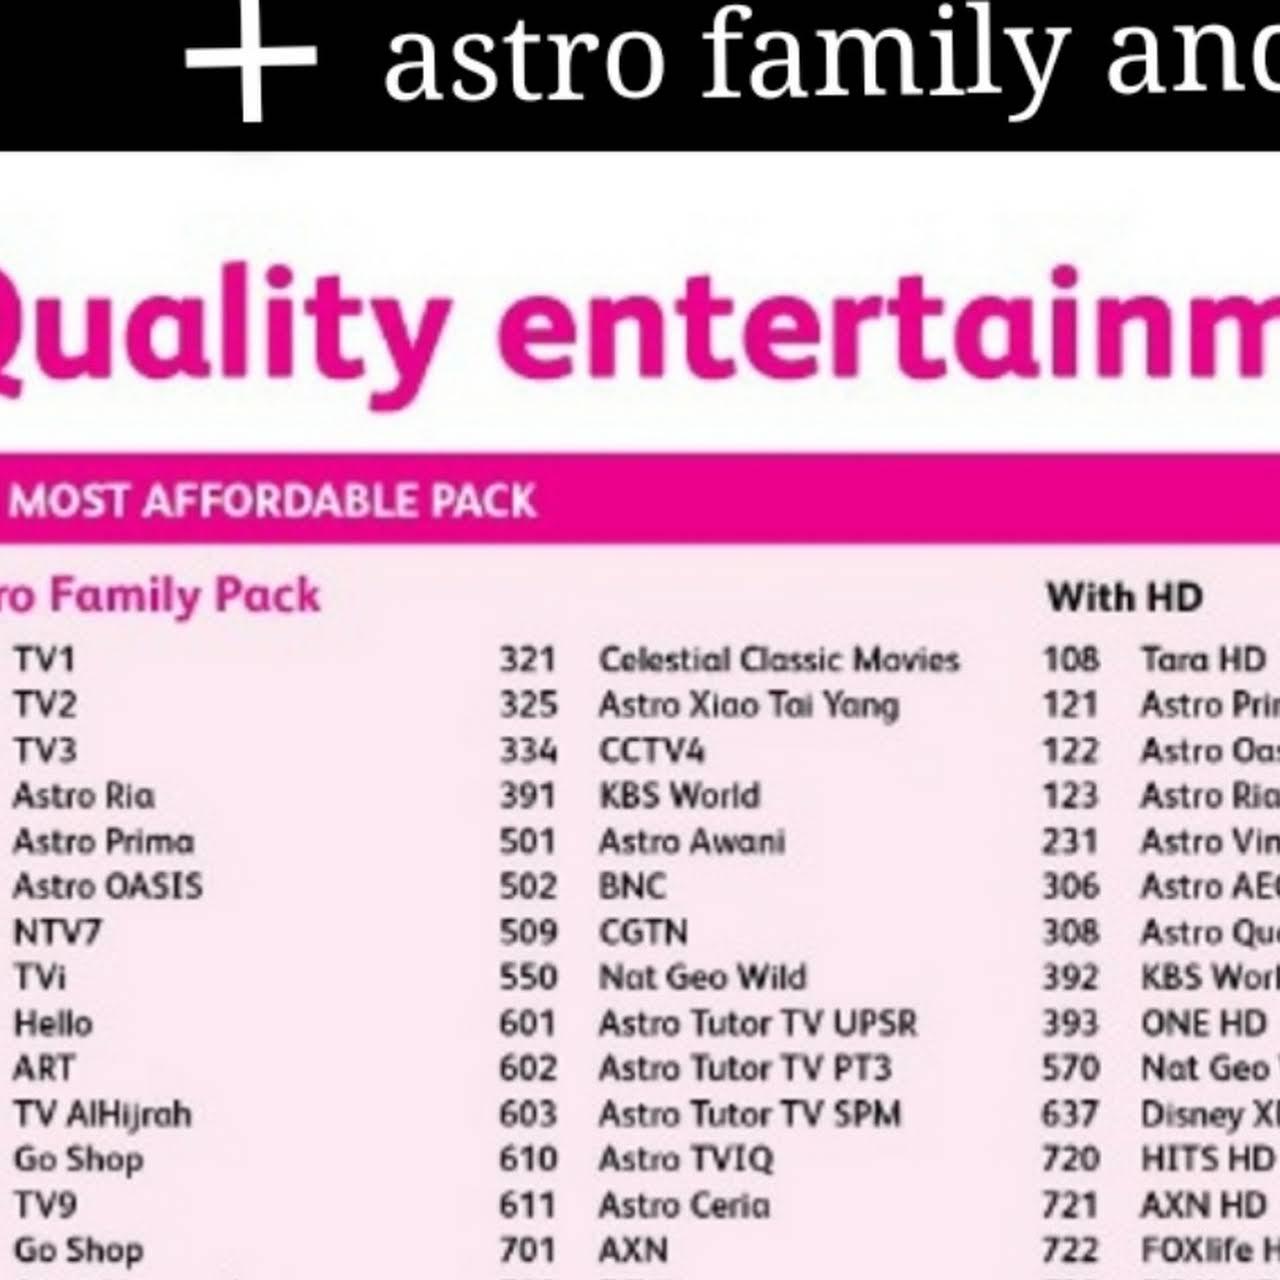 Astro All Service Astro Pemasangan Baru Njoi Pvr Ultra Box Mytv Digital Tv In Selangor Shah Alam Klang Subang Jaya Klang Valley And Selangor Area Please Call Or Whatsap 0122347556 Electronics